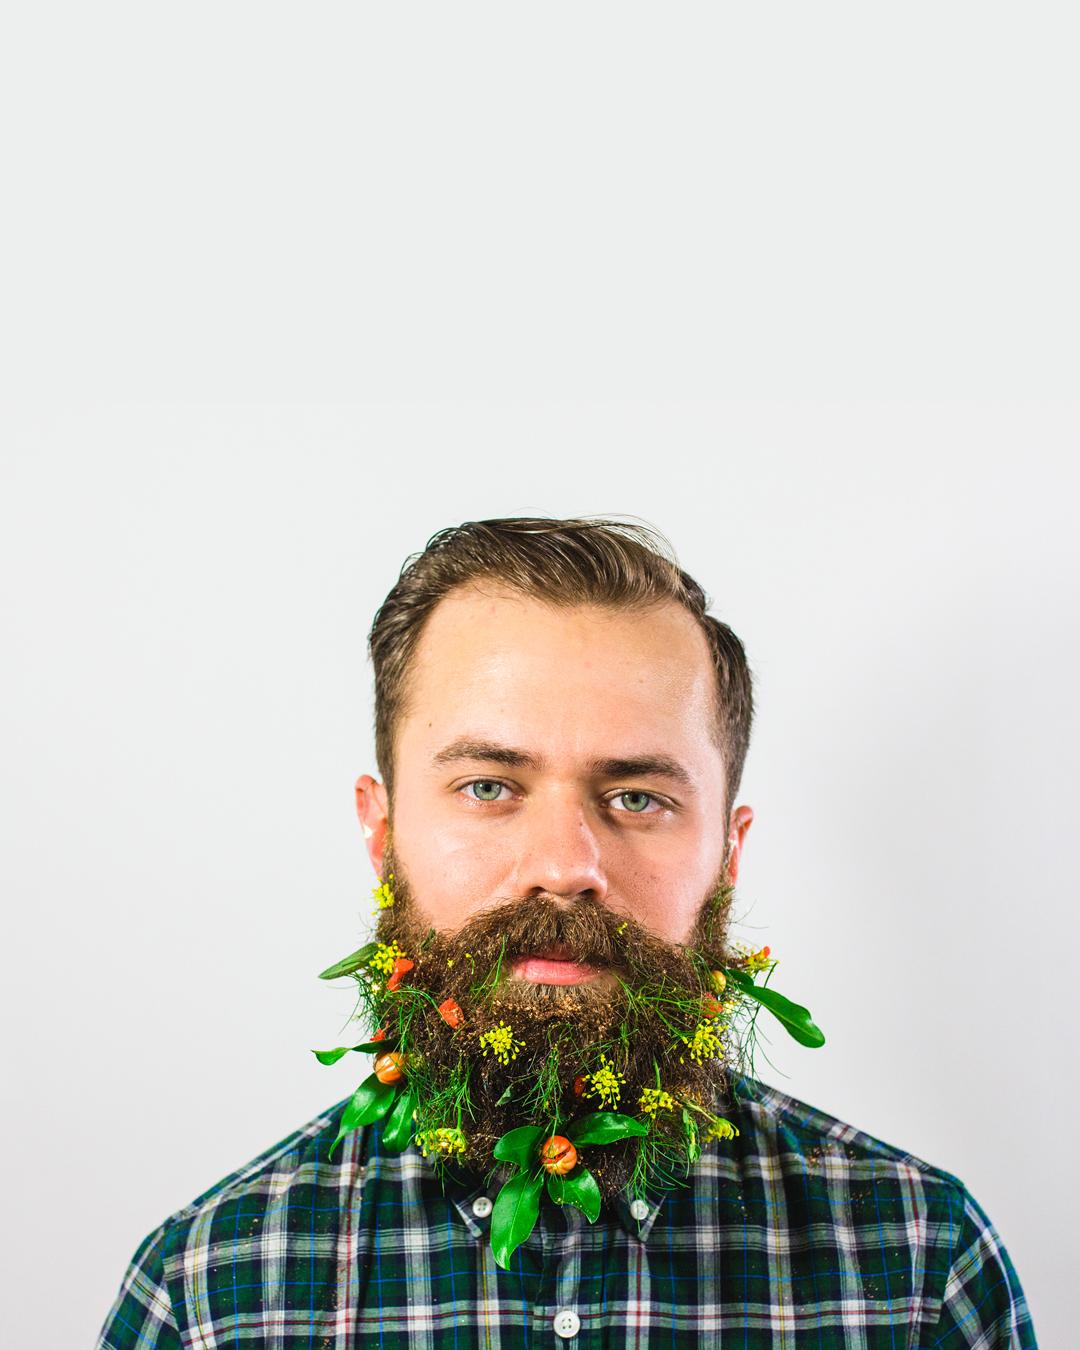 fiesta-beard-insta-post_2.JPG